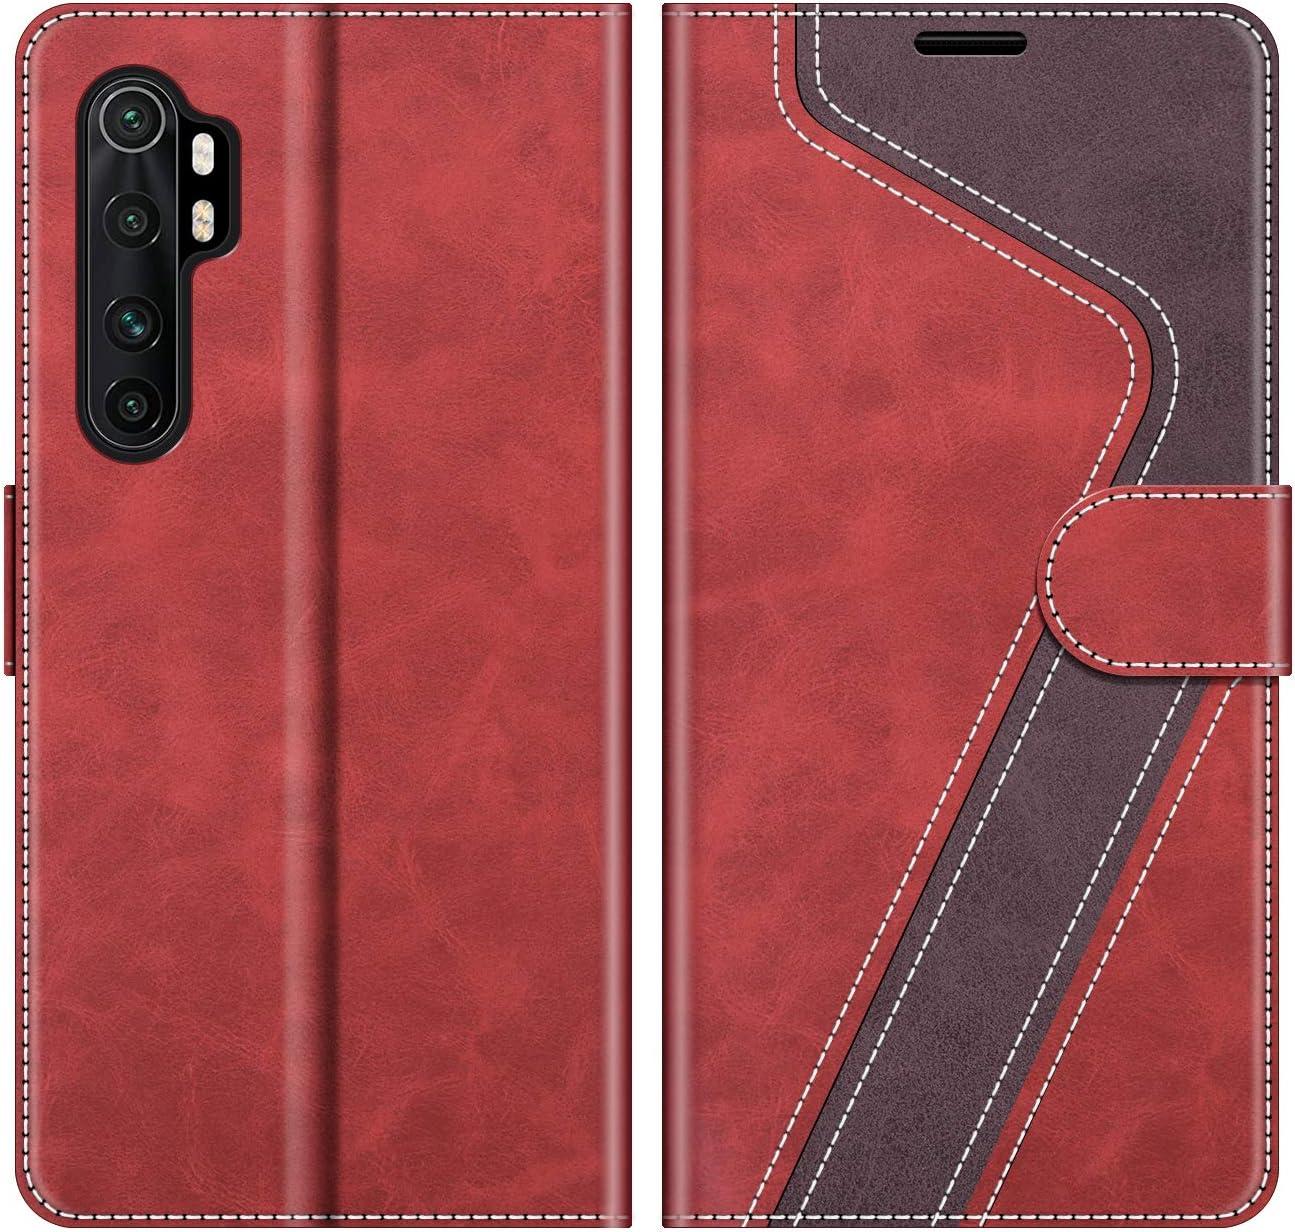 MOBESV Funda para Xiaomi Mi Note 10 Lite, Funda Libro Xiaomi Mi Note 10 Lite, Funda Móvil Xiaomi Mi Note 10 Lite Magnético Carcasa para Xiaomi Mi Note 10 Lite Funda con Tapa, Rojo